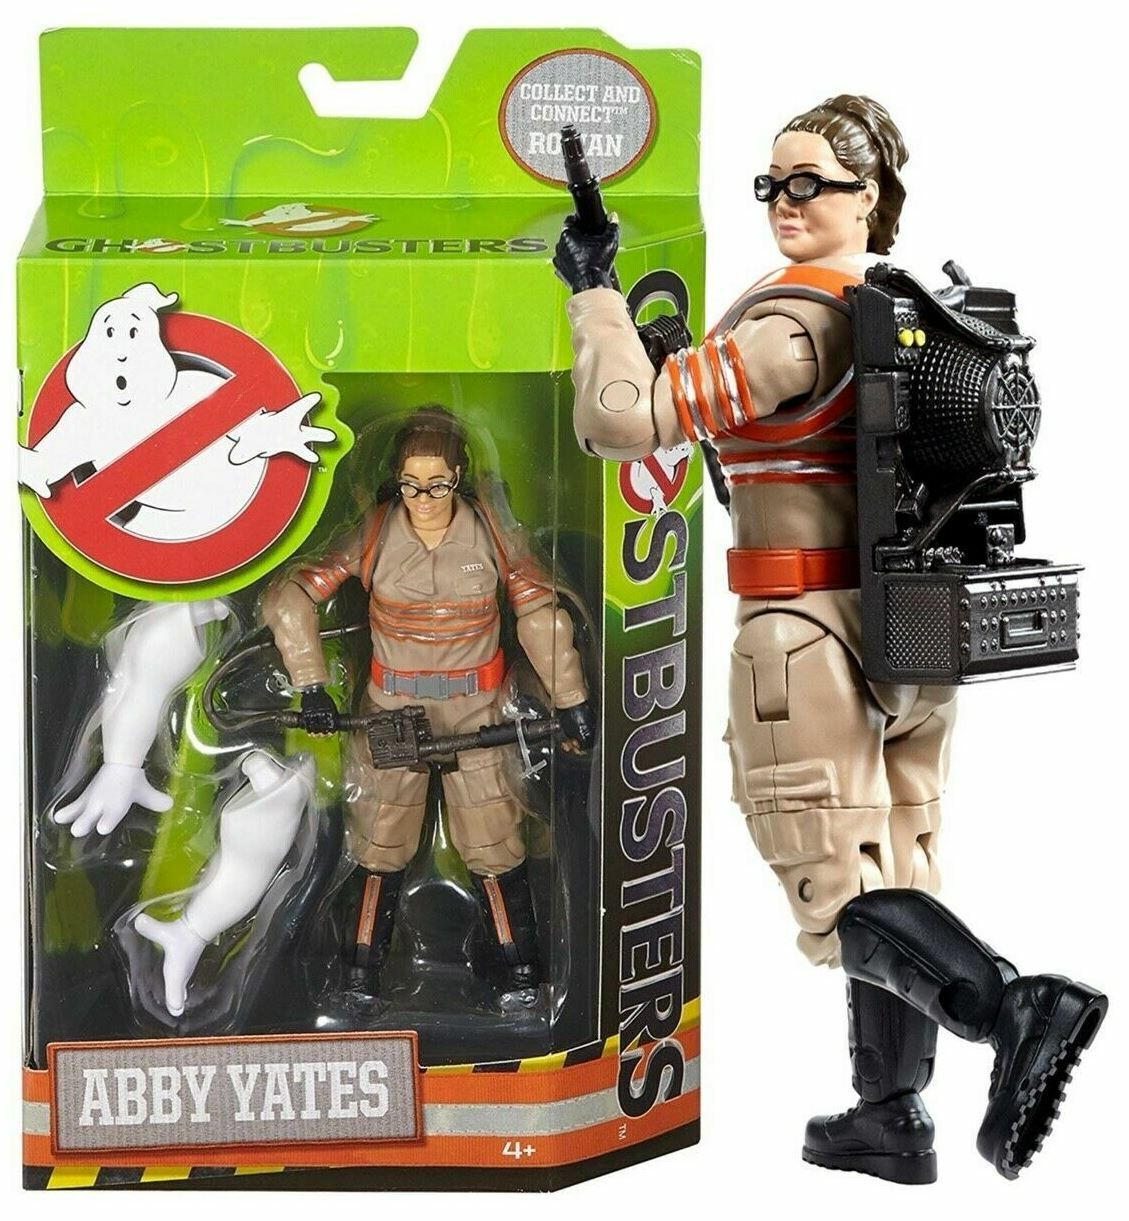 Ghostbusters Wirkung Figure Abby Yates Mattel